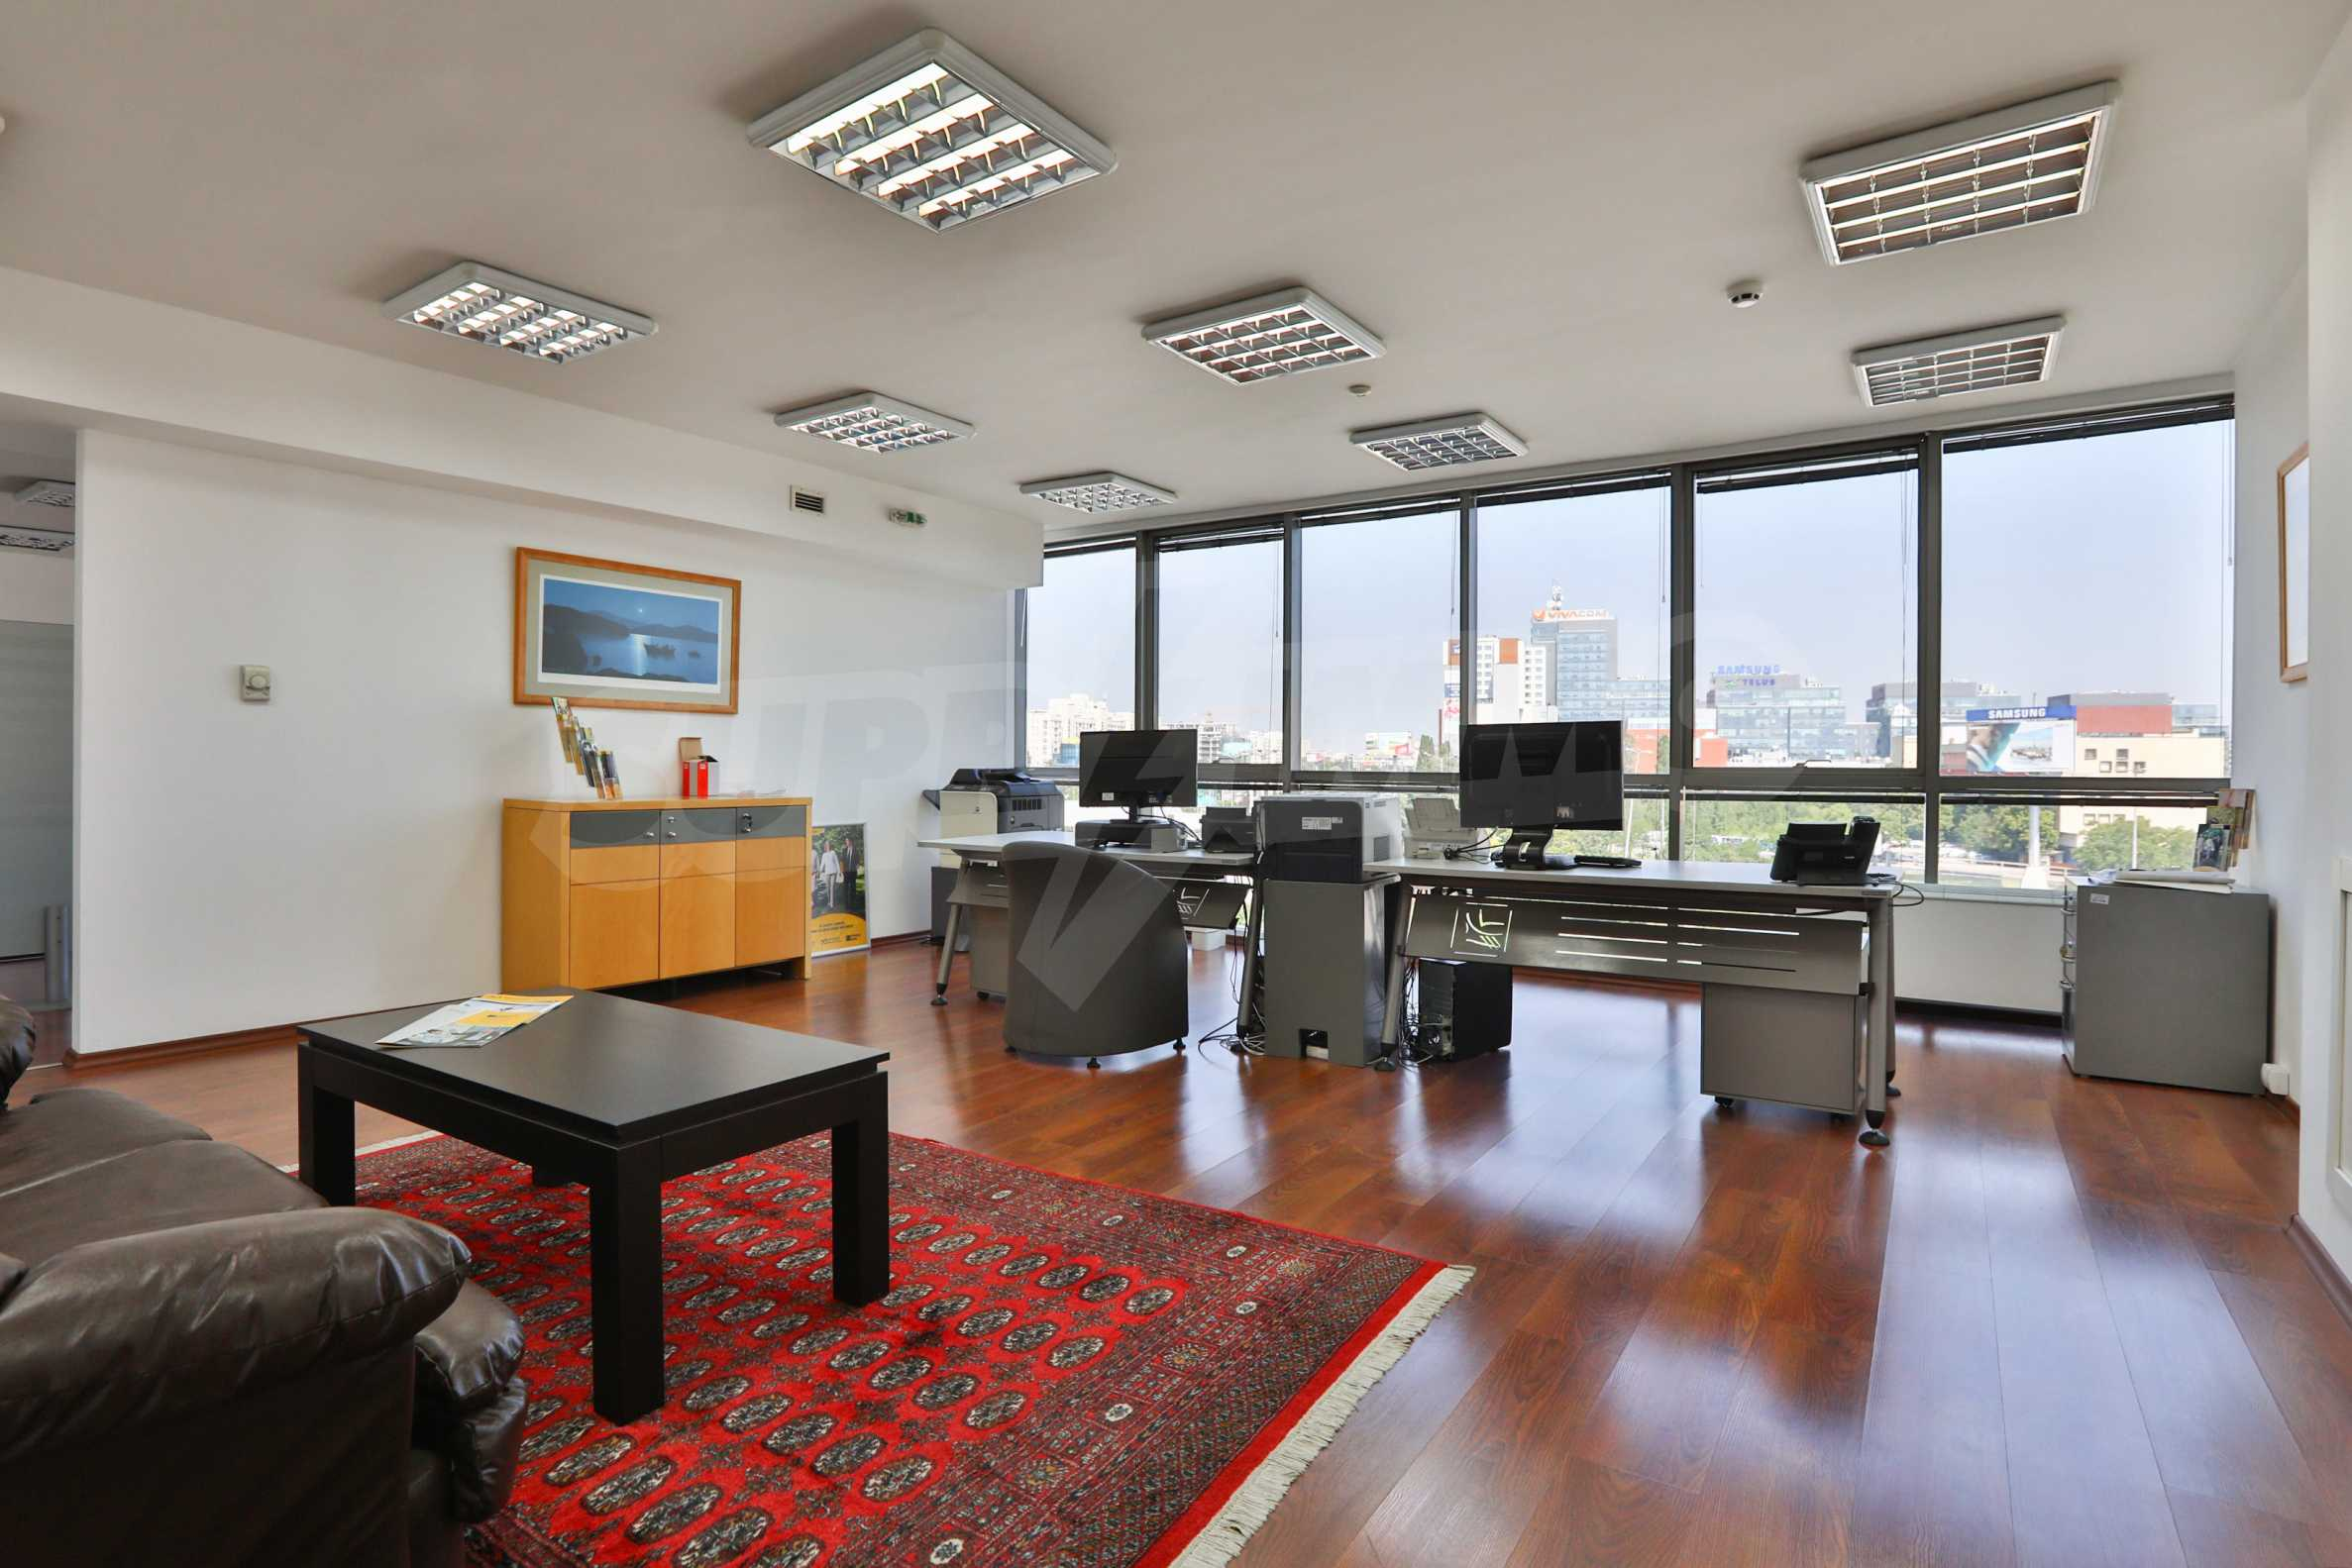 Офис в бизнес сграда висок клас на бул. Цариградско шосе 30